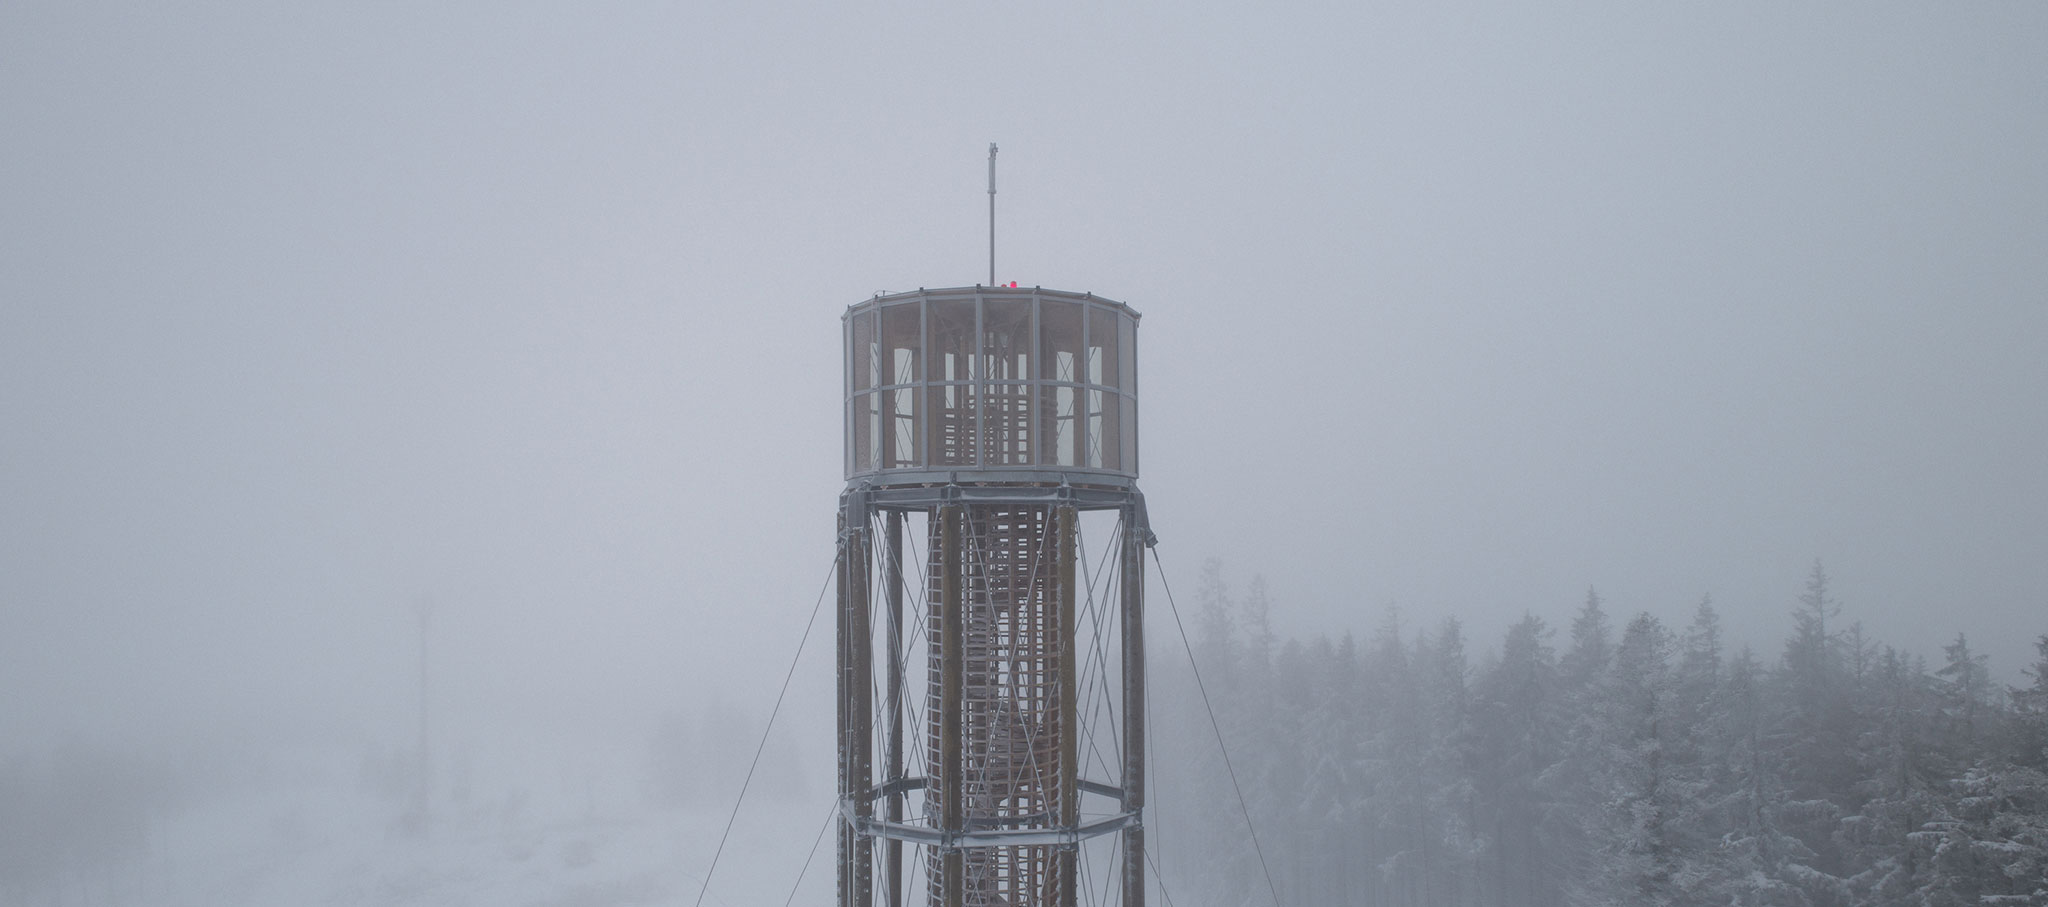 Torre de vigilancia en Kraličák por MgA. David Kubík. Fotografía por Jakub Skokan, Martin Tůma / BoysPlayNice